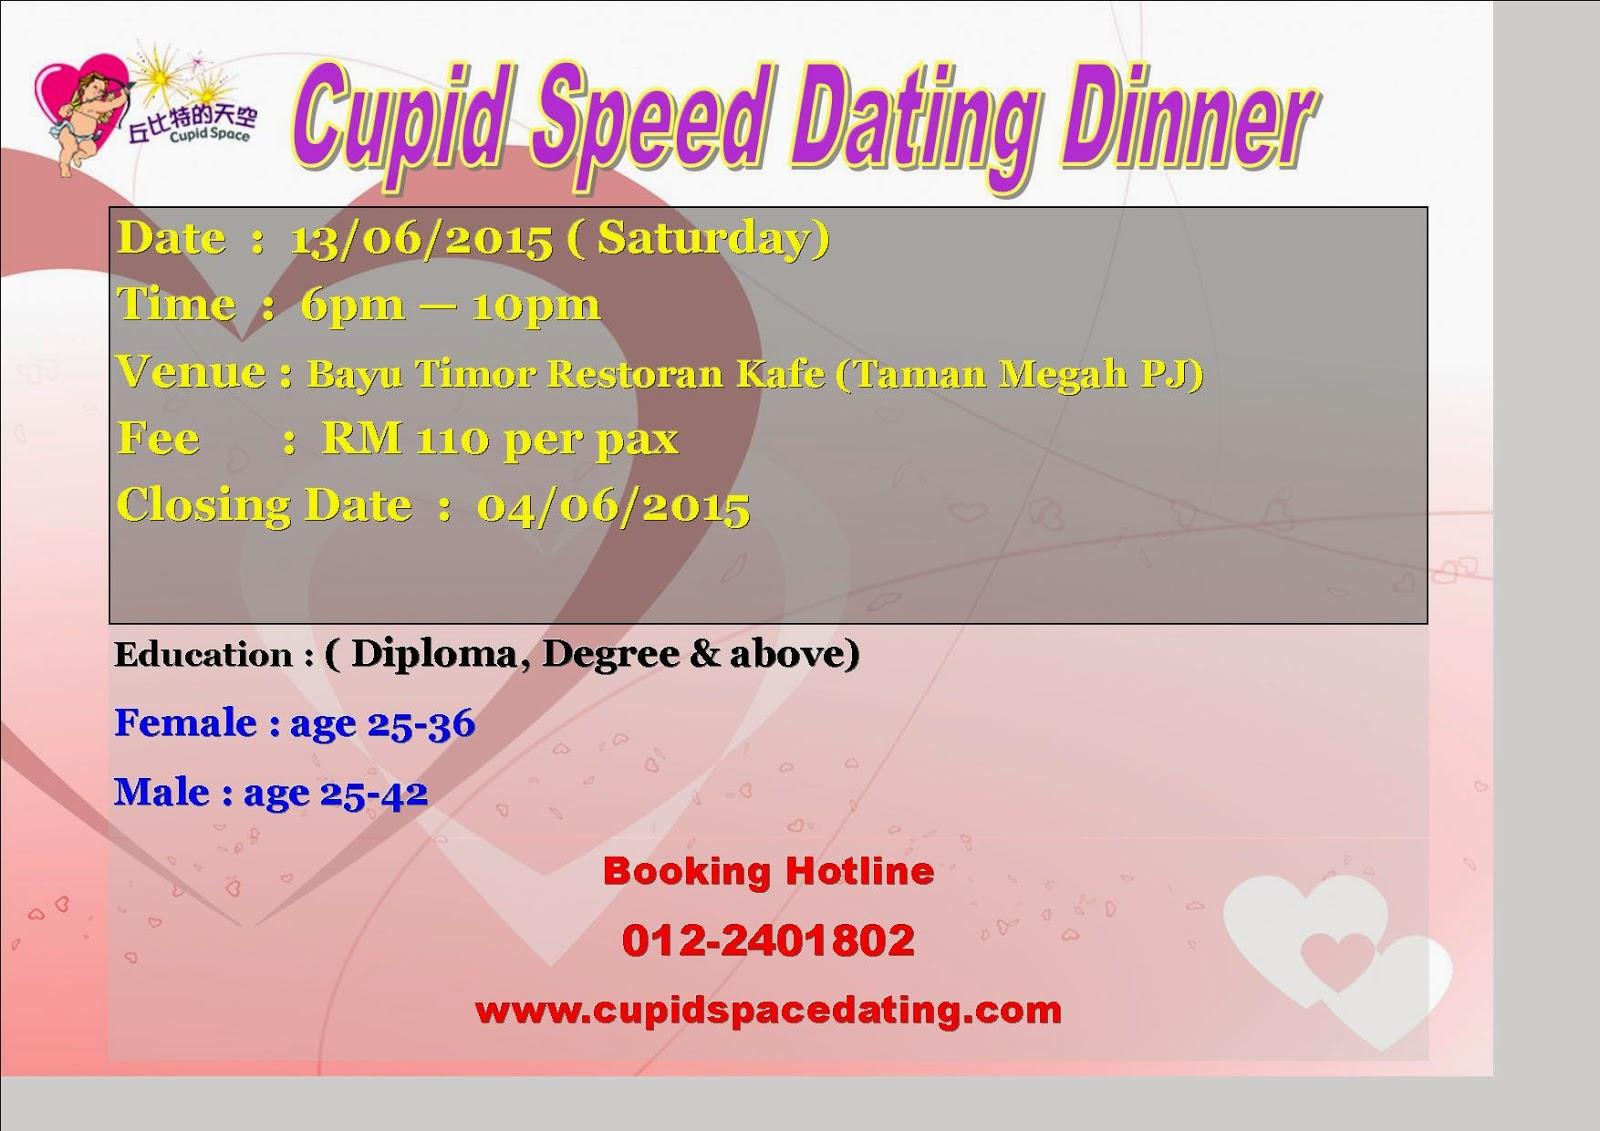 Speed dating dinner